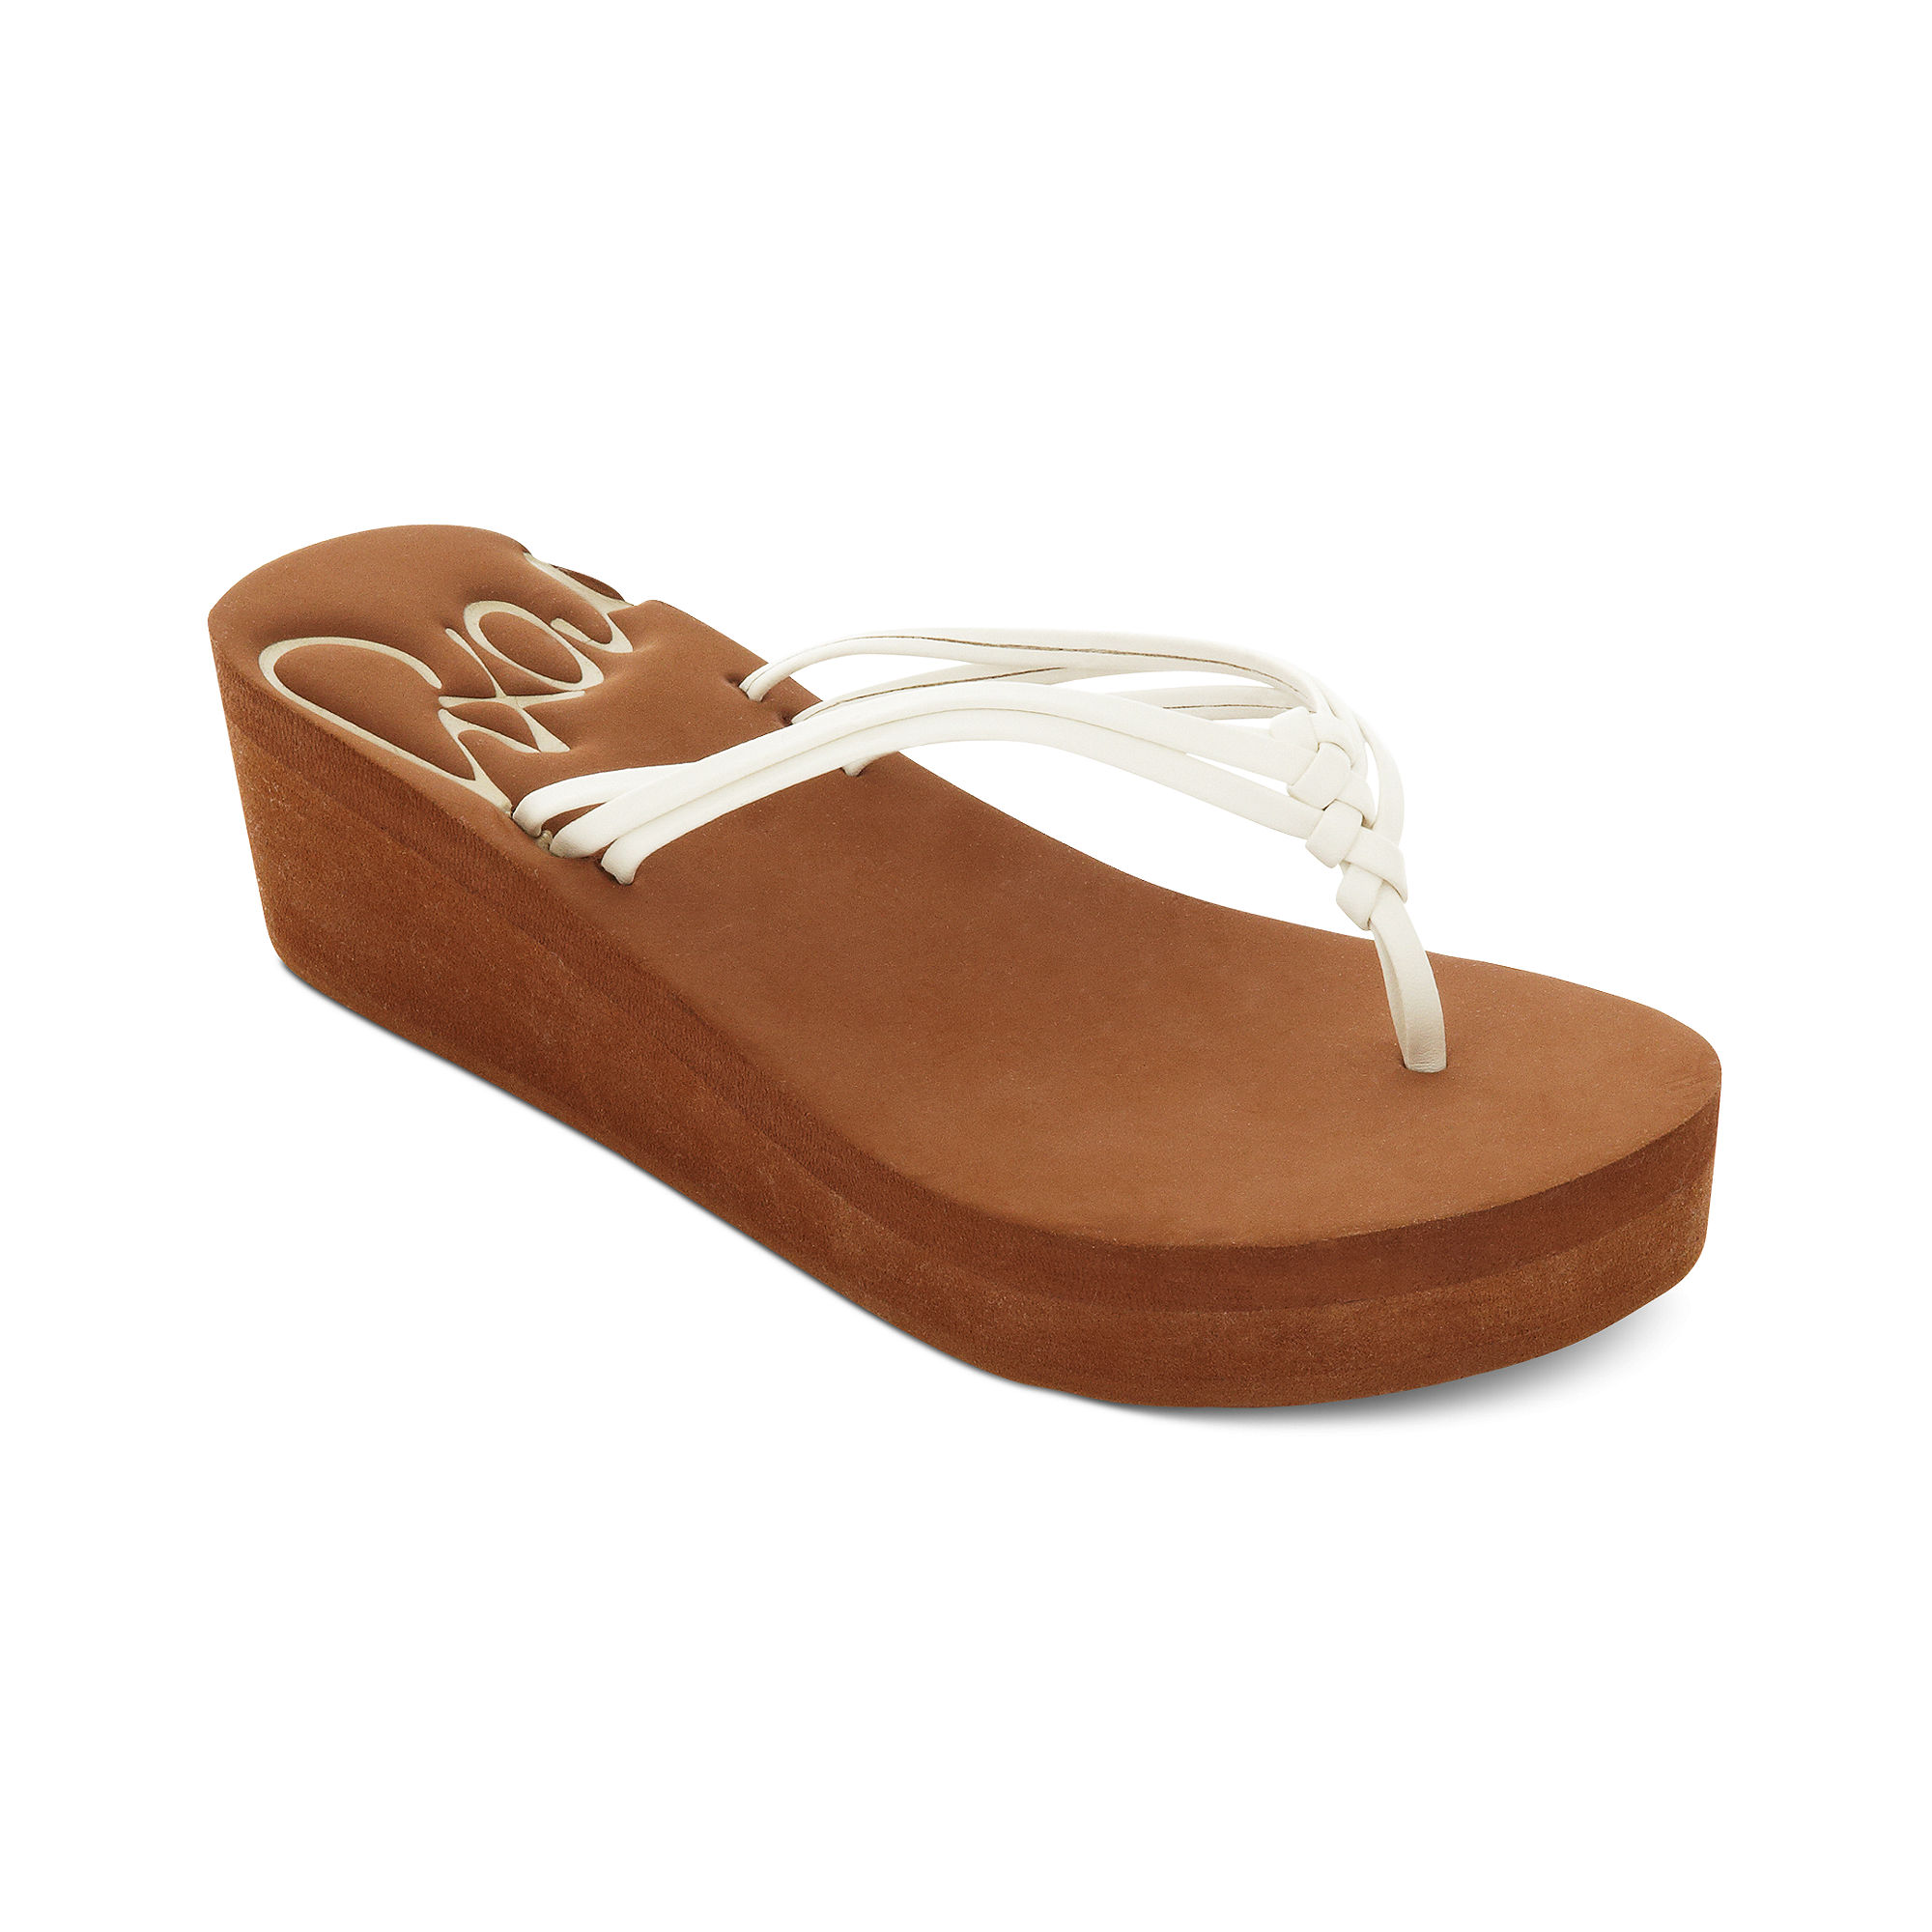 Roxy Palmilla Platform Wedge Thong Sandals In White Lyst